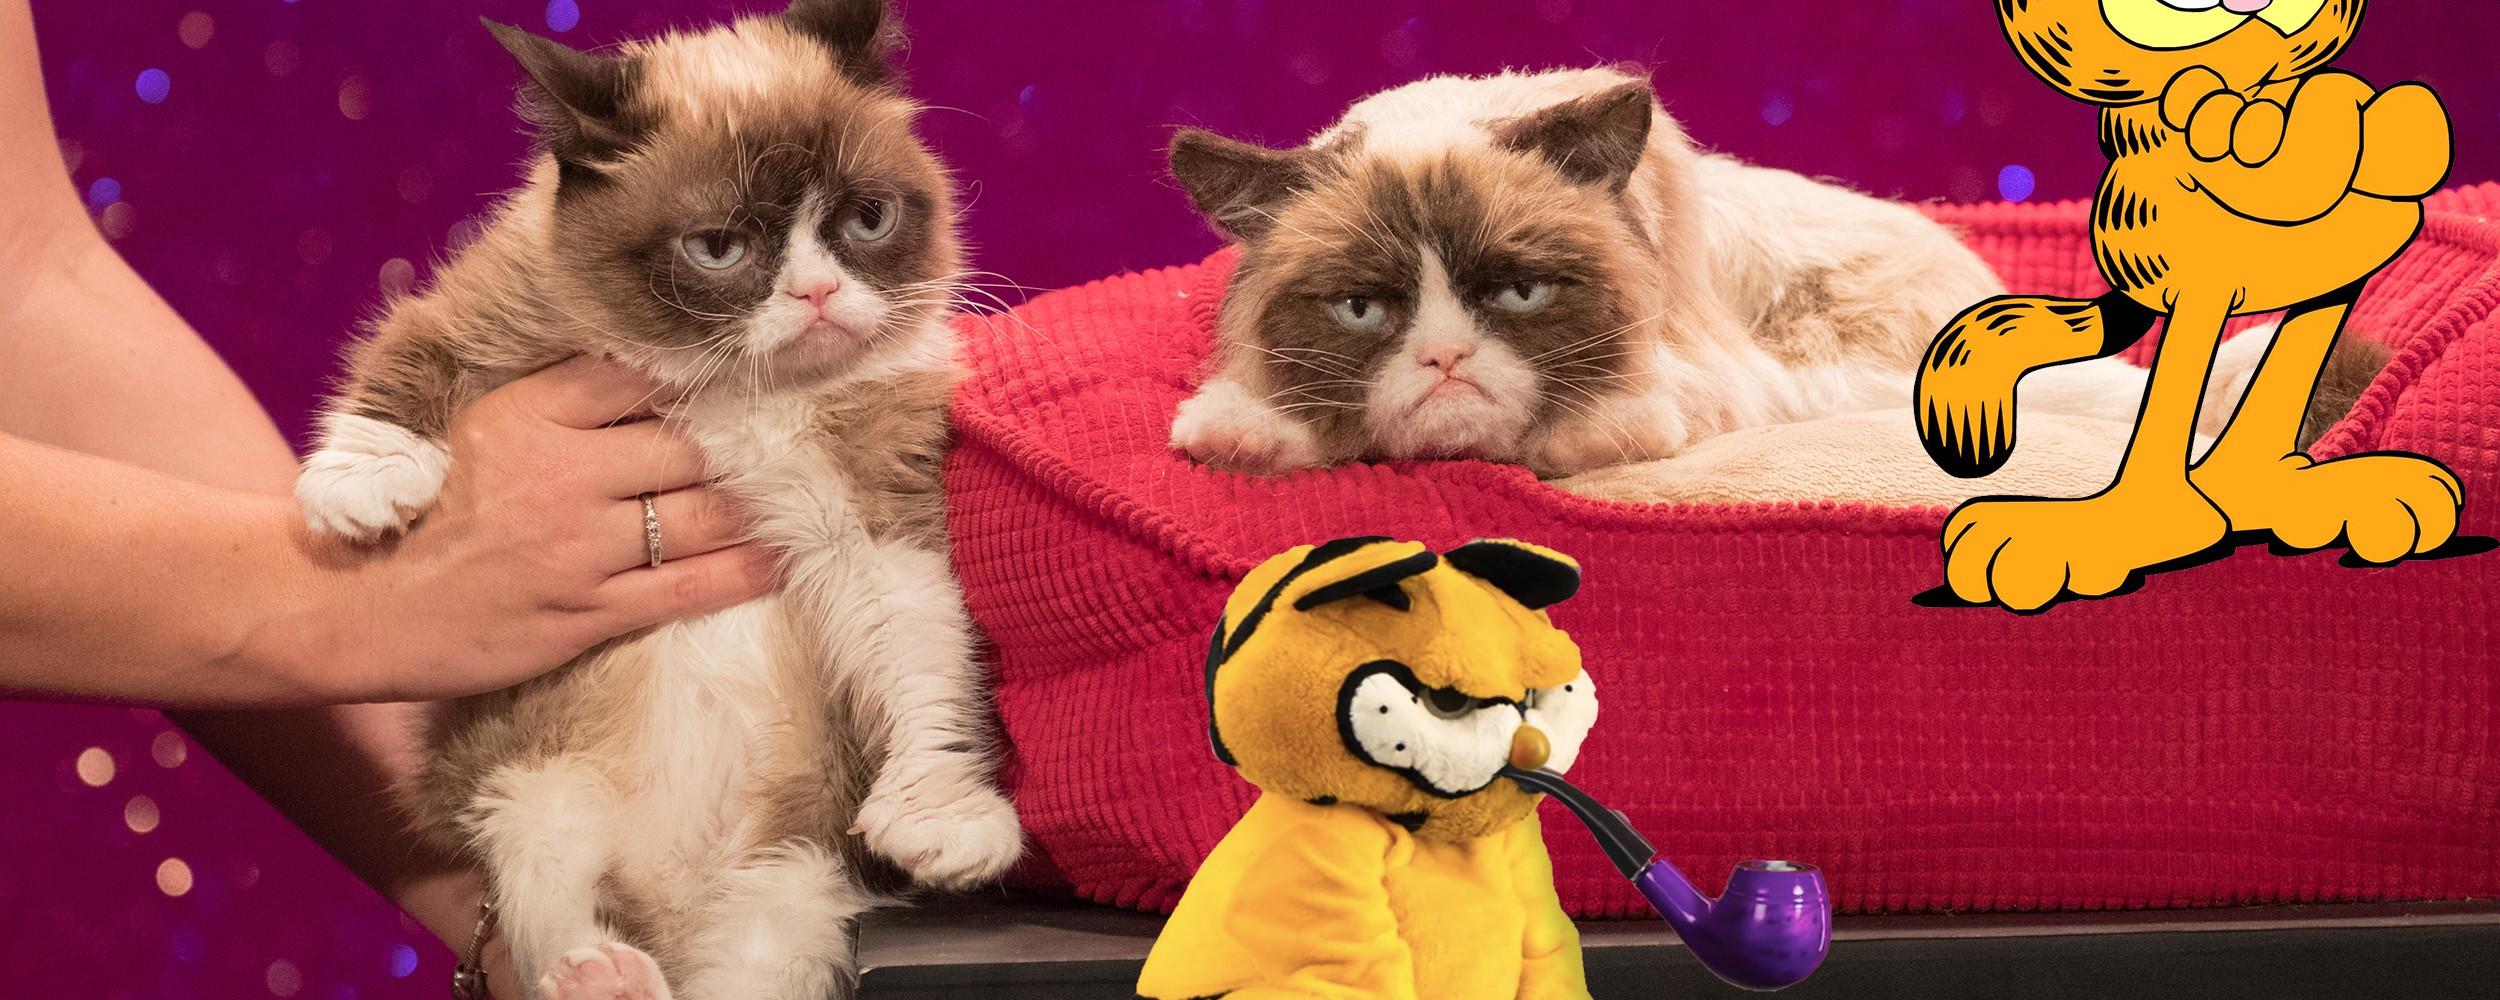 Garfield S Lament Grumpy Cat Was A Meme Born Dead